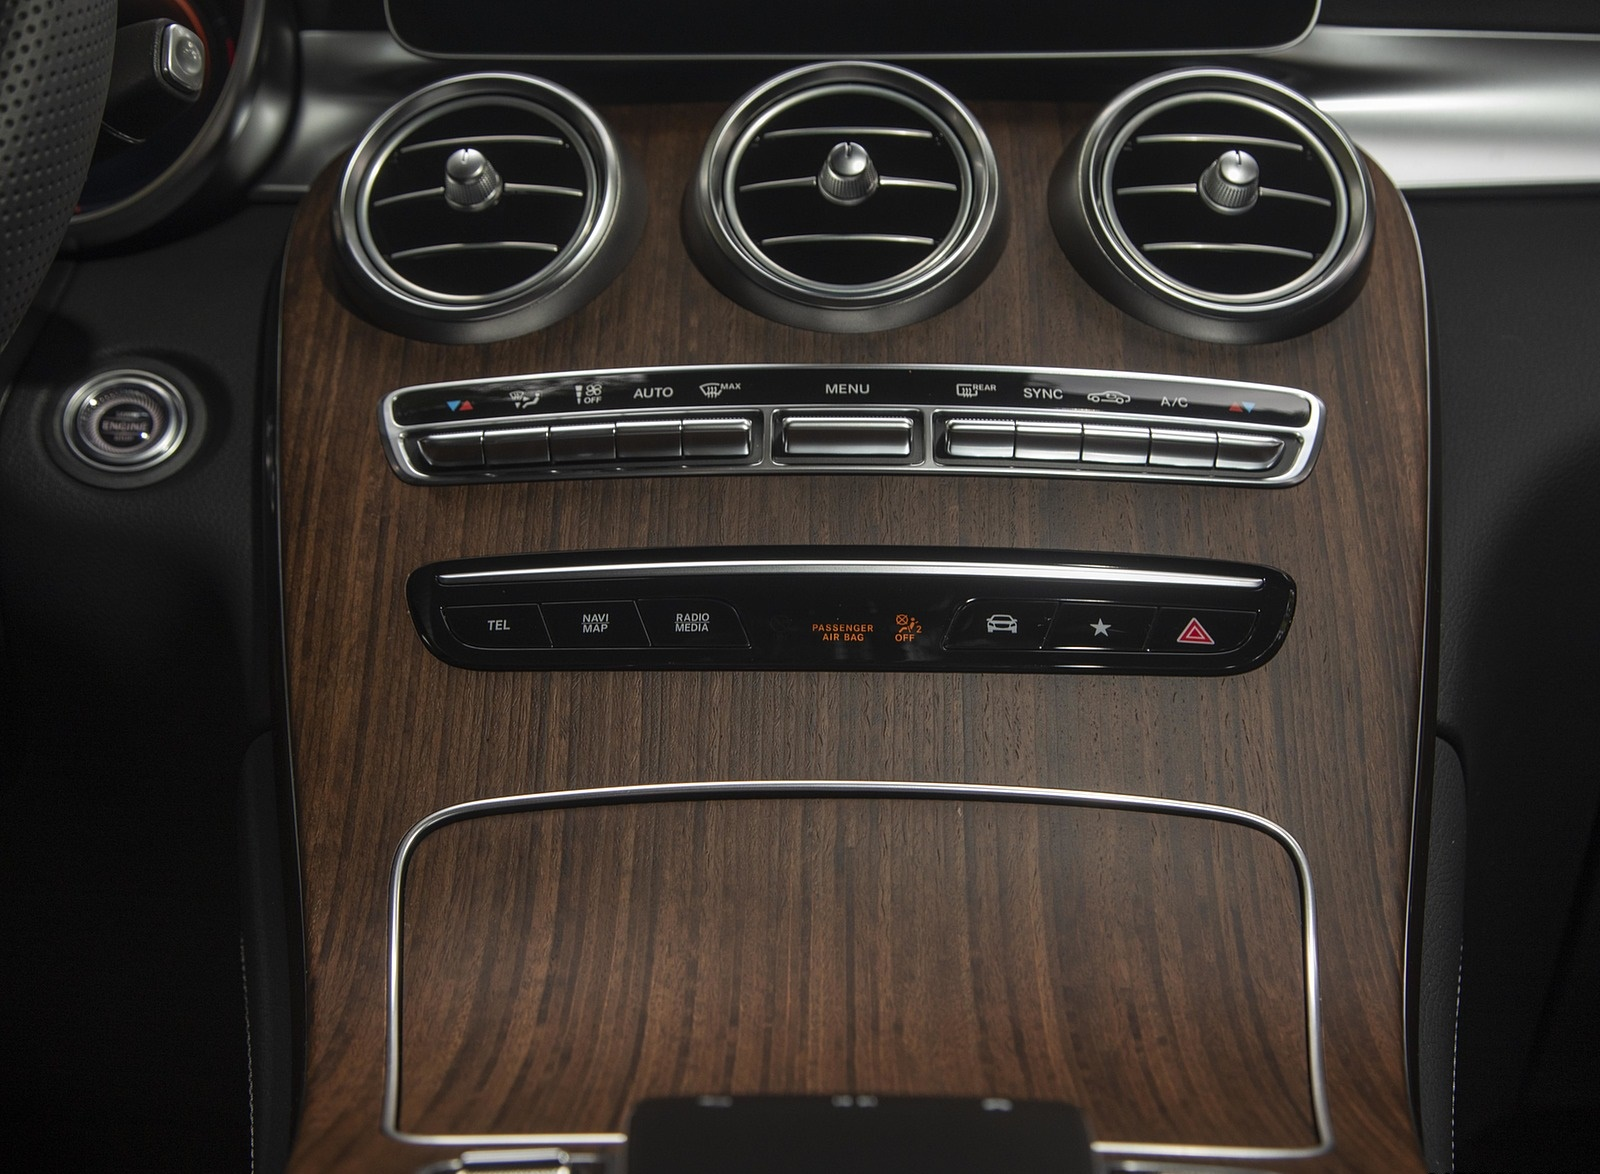 2020 Mercedes-Benz GLC 300 (US-Spec) Interior Detail Wallpapers #29 of 62